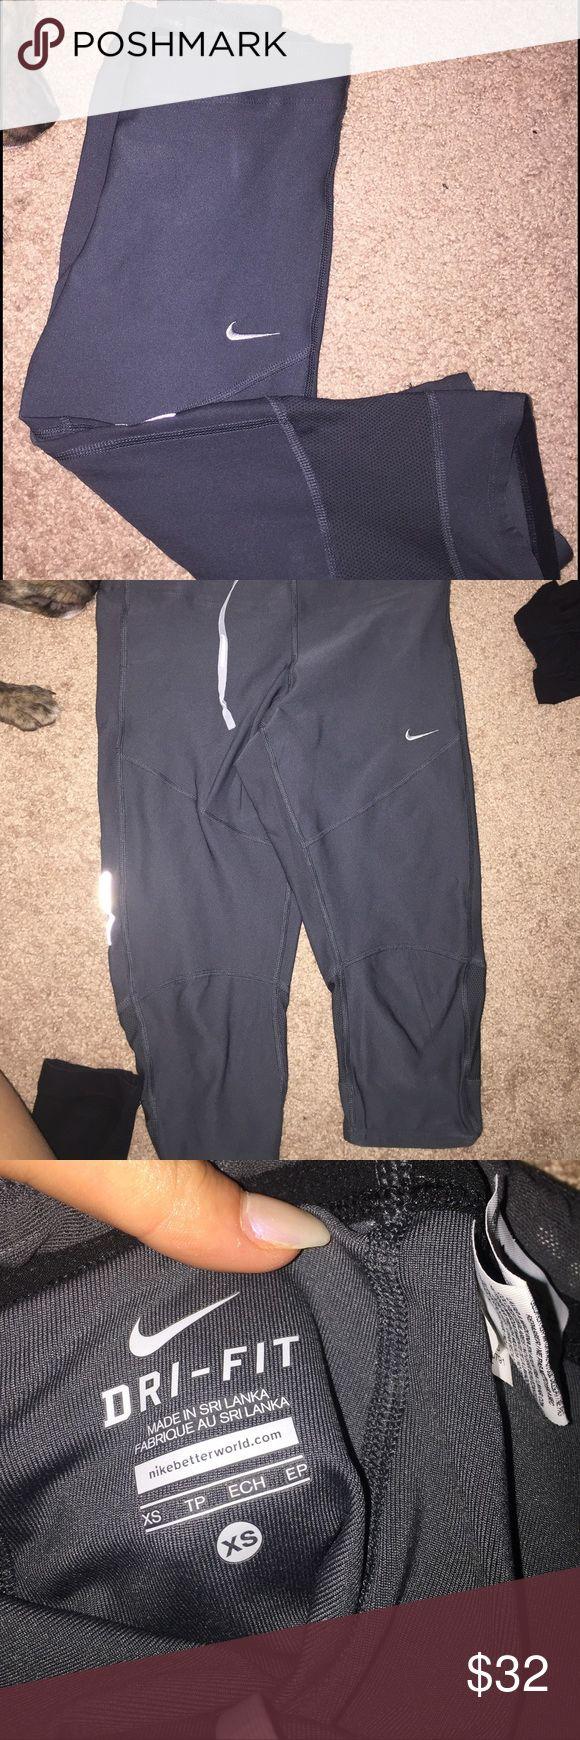 Crop DRI-FIT Nike leggings Worn once Nike dri-fit grey leggings size XS!!!(ignore my puppy) Nike Pants Leggings